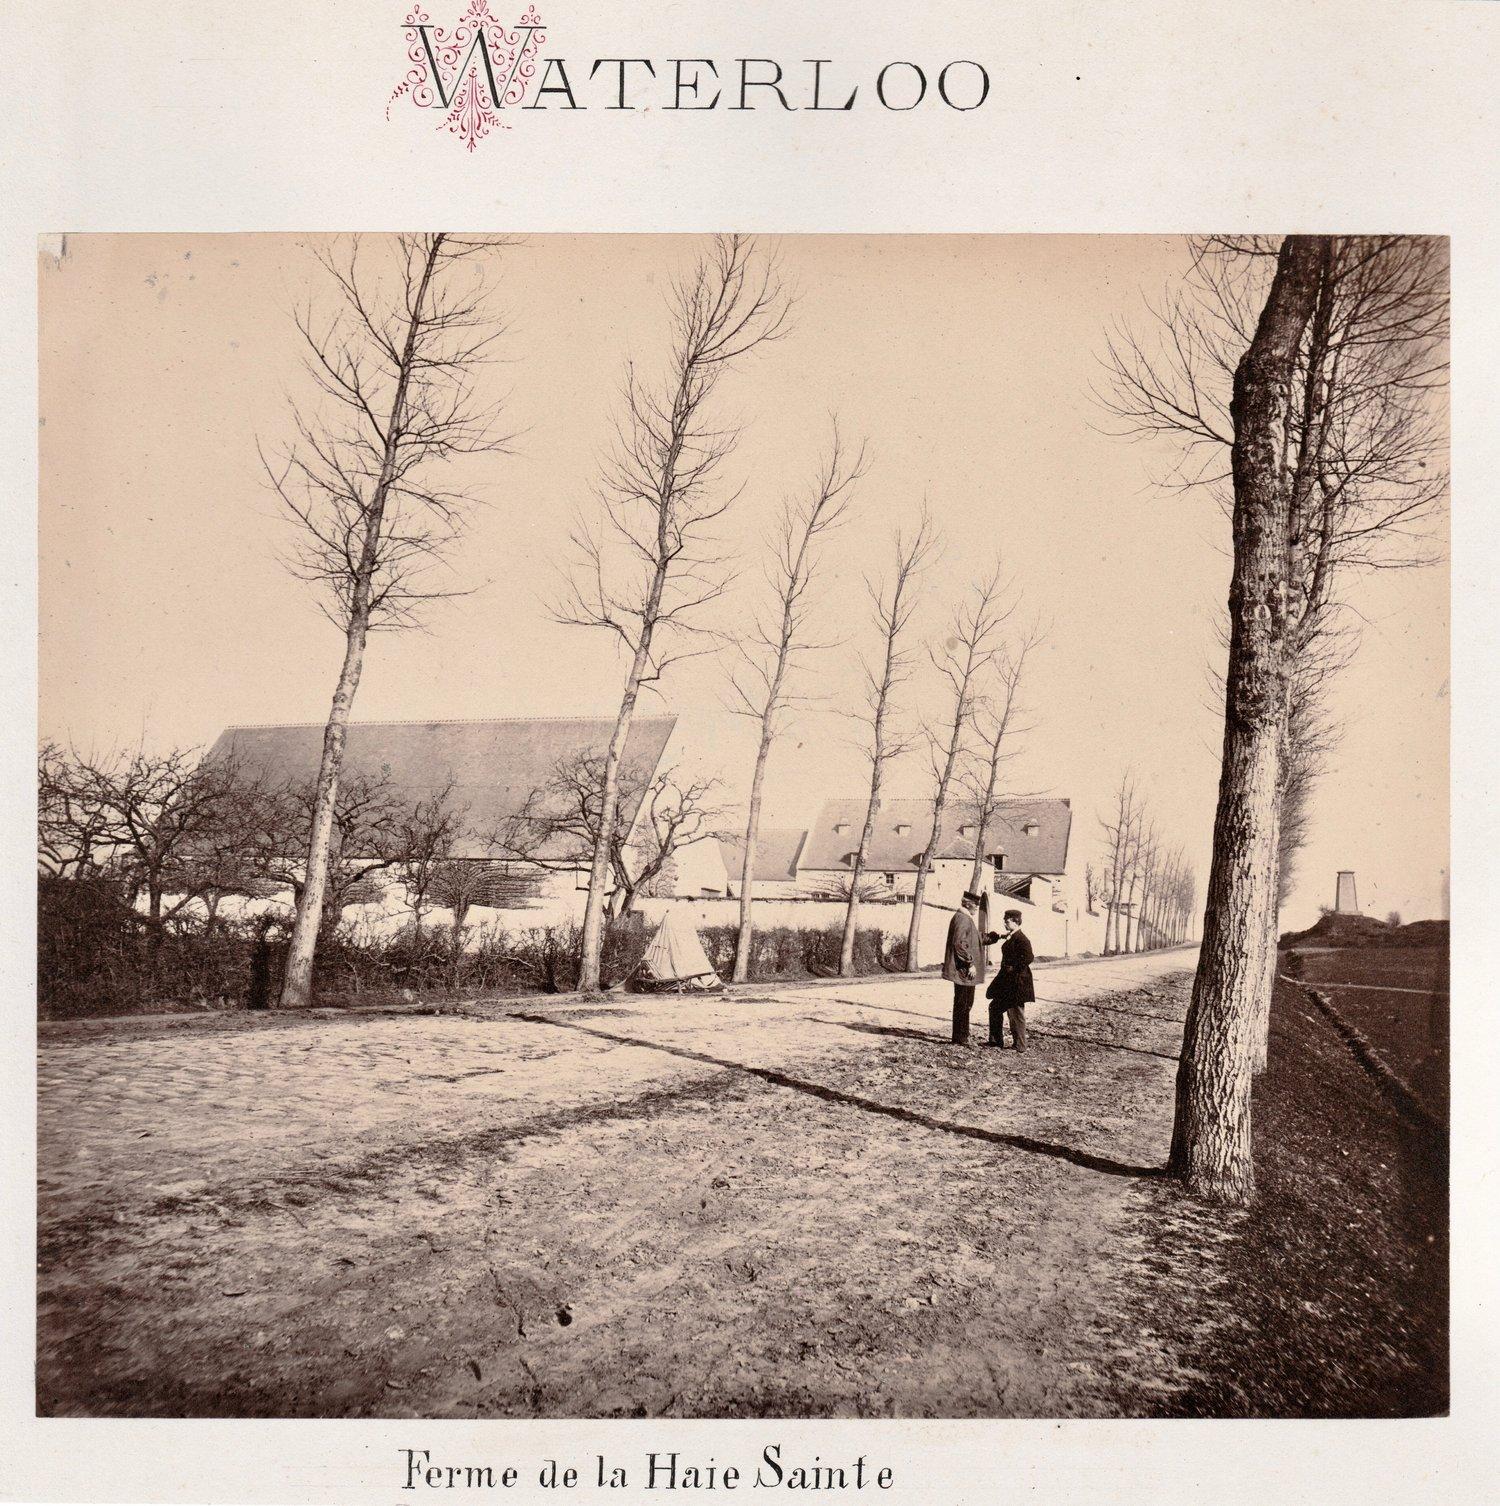 Image of Adolphe Braun: Waterloo, la Ferme de la Haie Sainte, ca. 1864